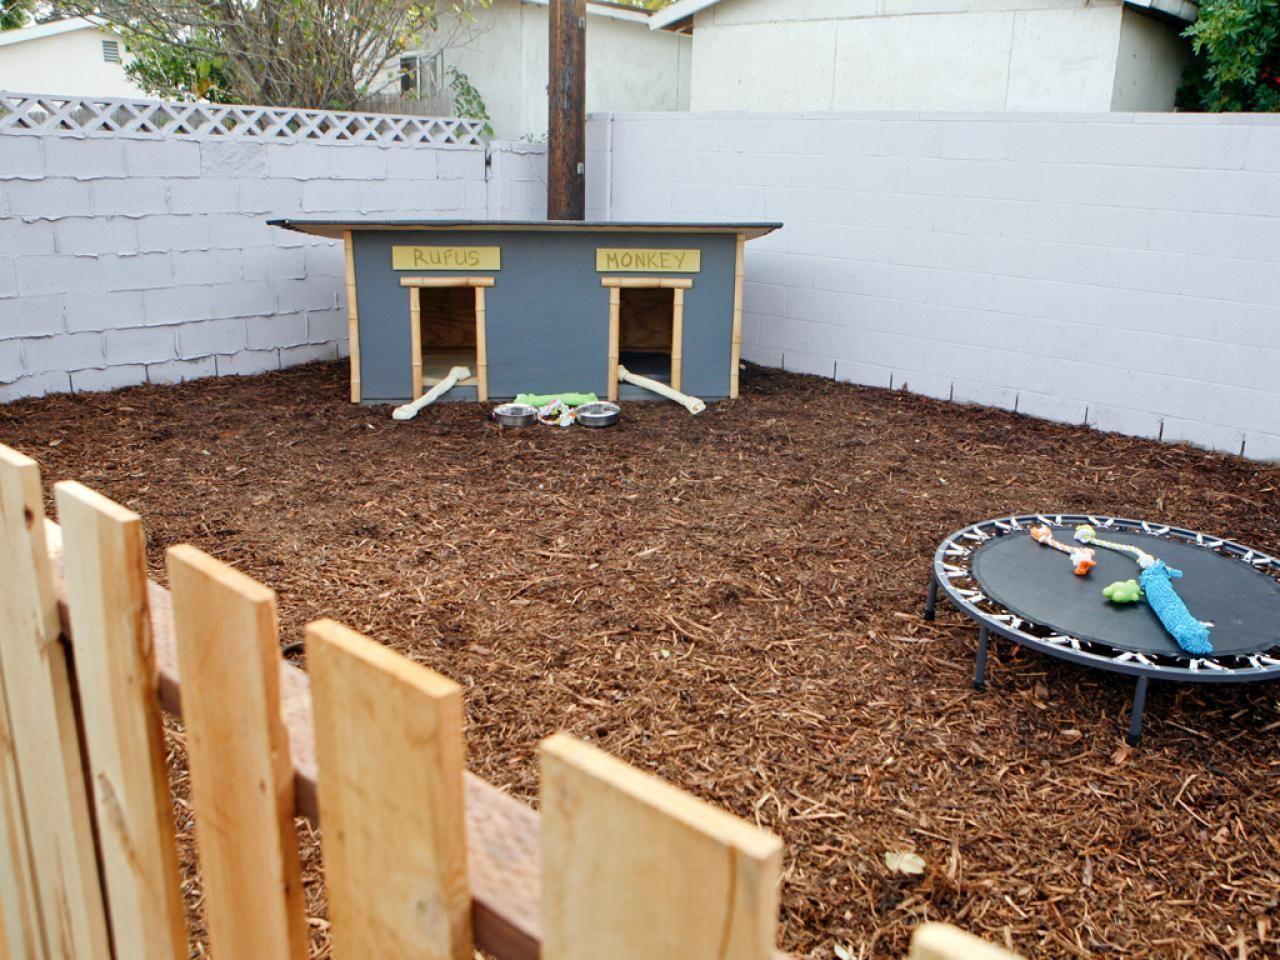 Mulch Works Well For This Pet Friendly Area. Hot Backyard Design Ideas To  Try Now. Garten LandschaftsdesignHardscape DesignHinterhof ...